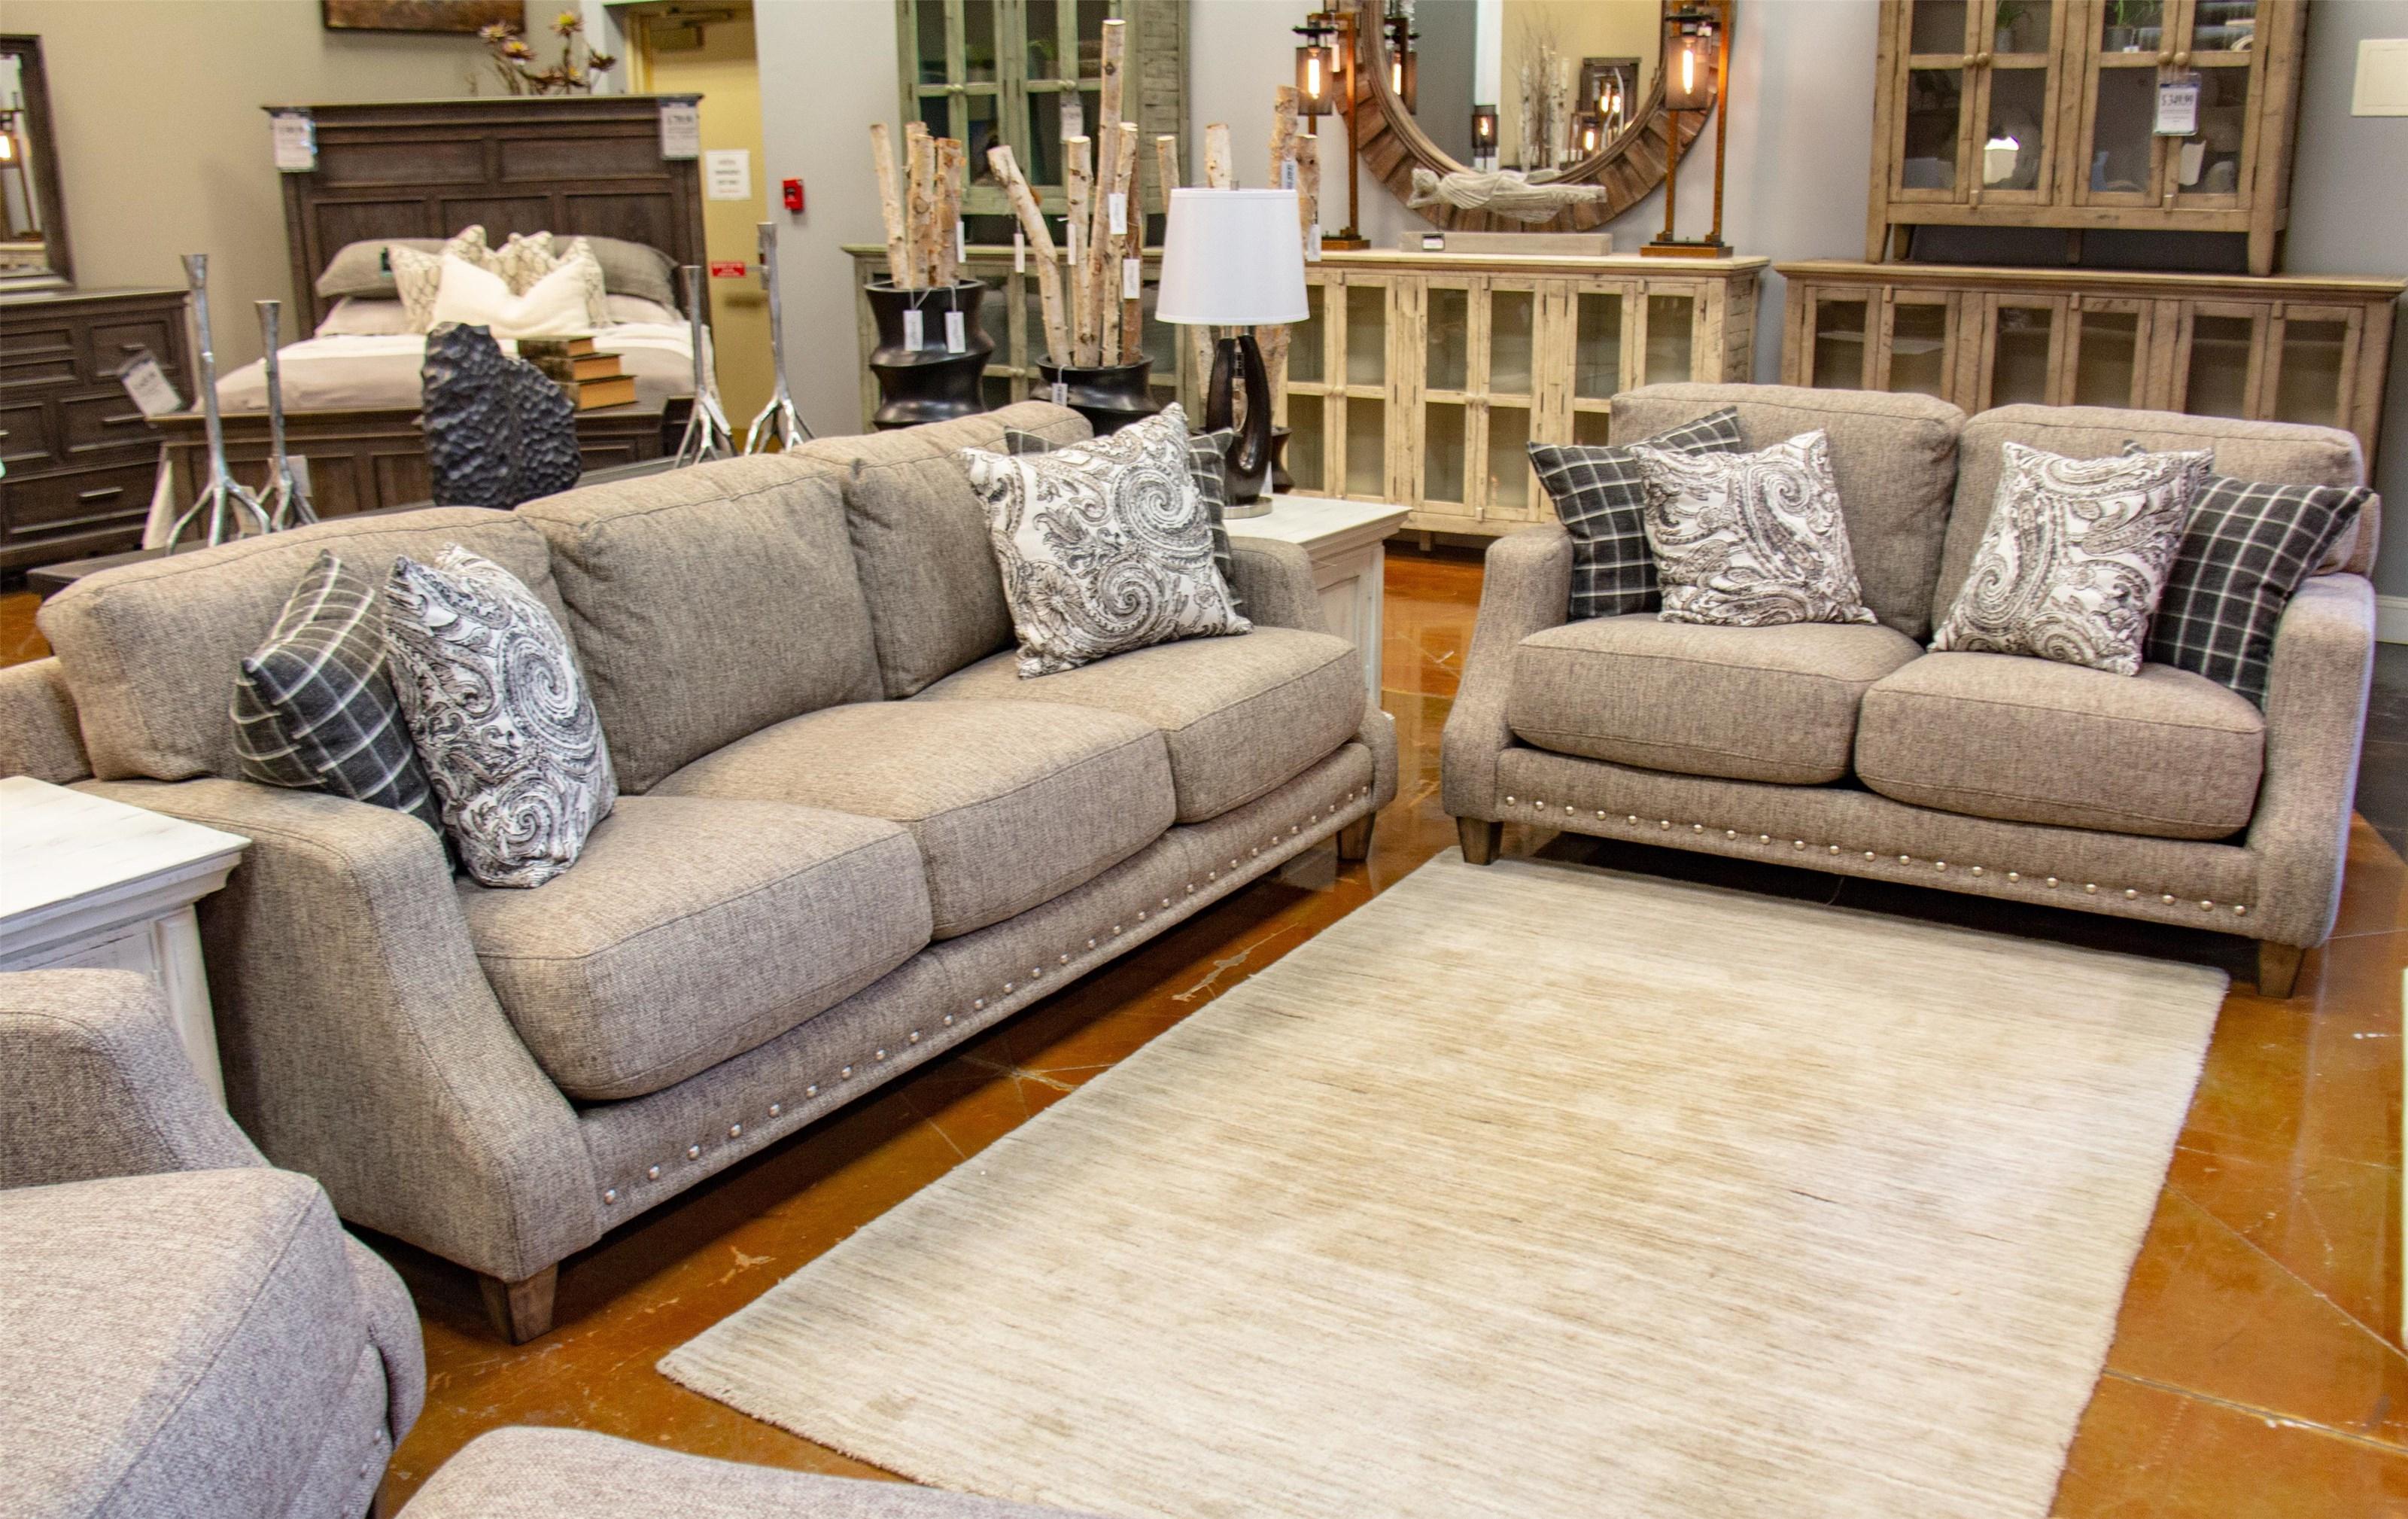 Franklin Gramercy Gramercy Sofa and Loveseat - Item Number: GRP-863XX-SL